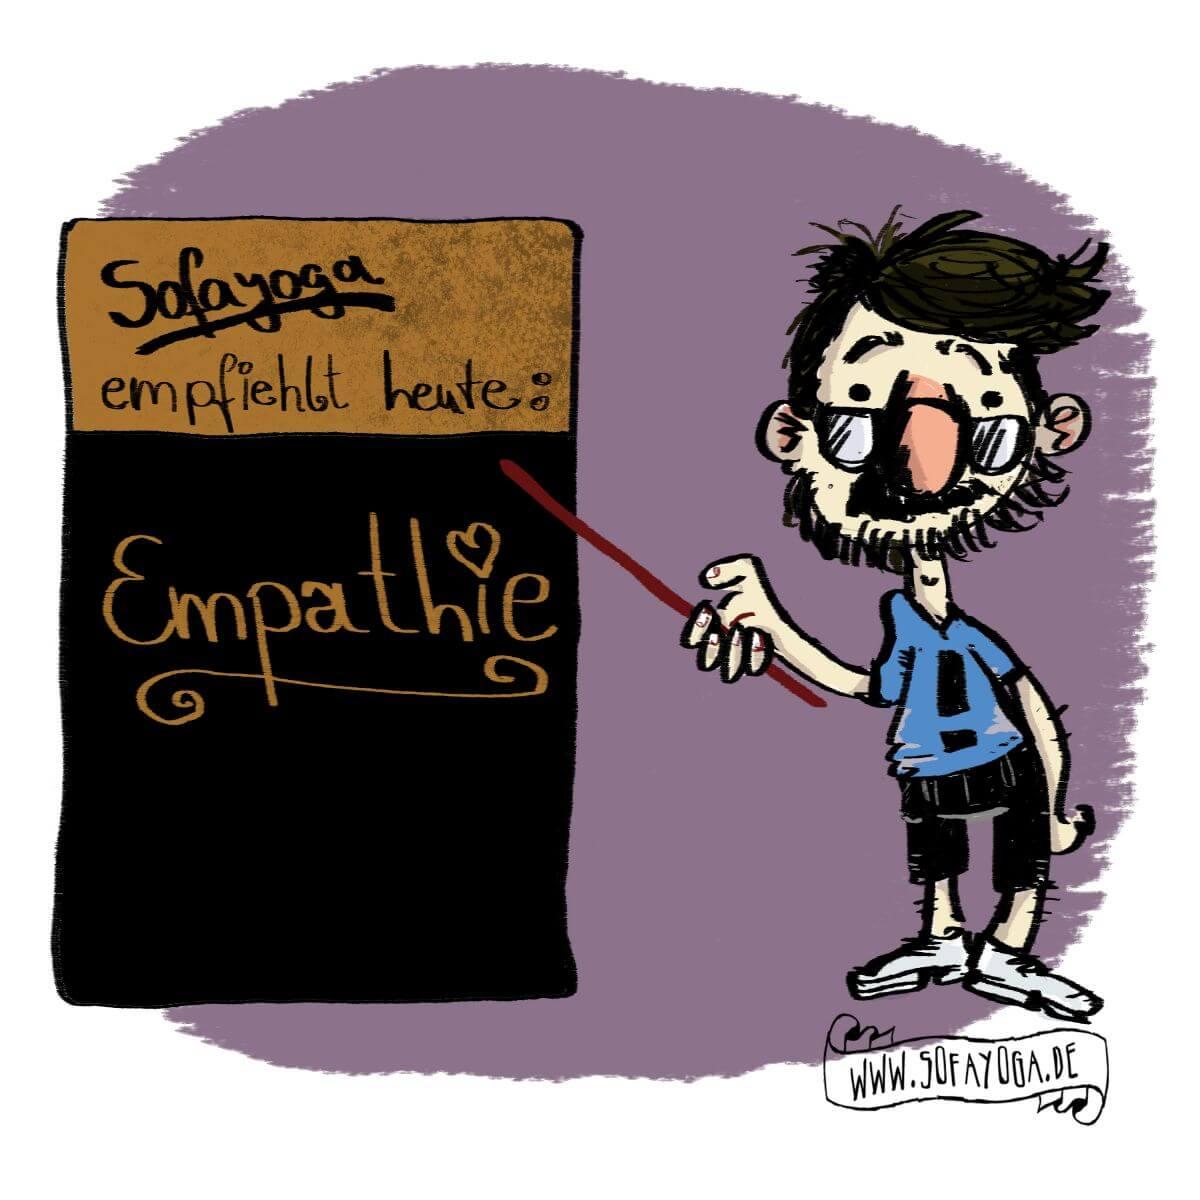 Sofayoga empfiehlt heute Empathie